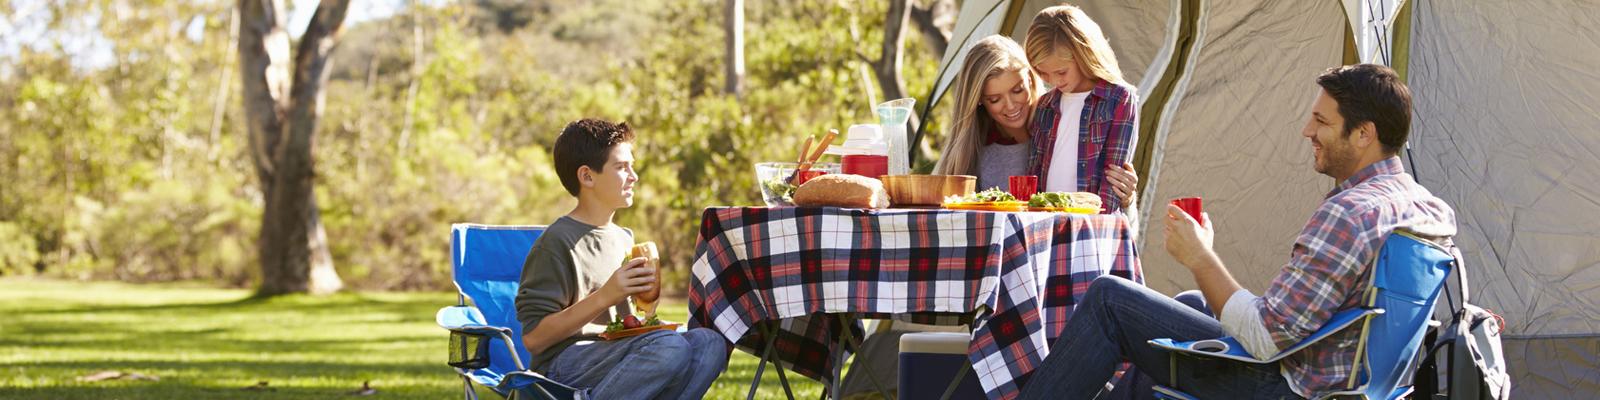 Erholungspark Mondsee Einfach Uebernachten Camping